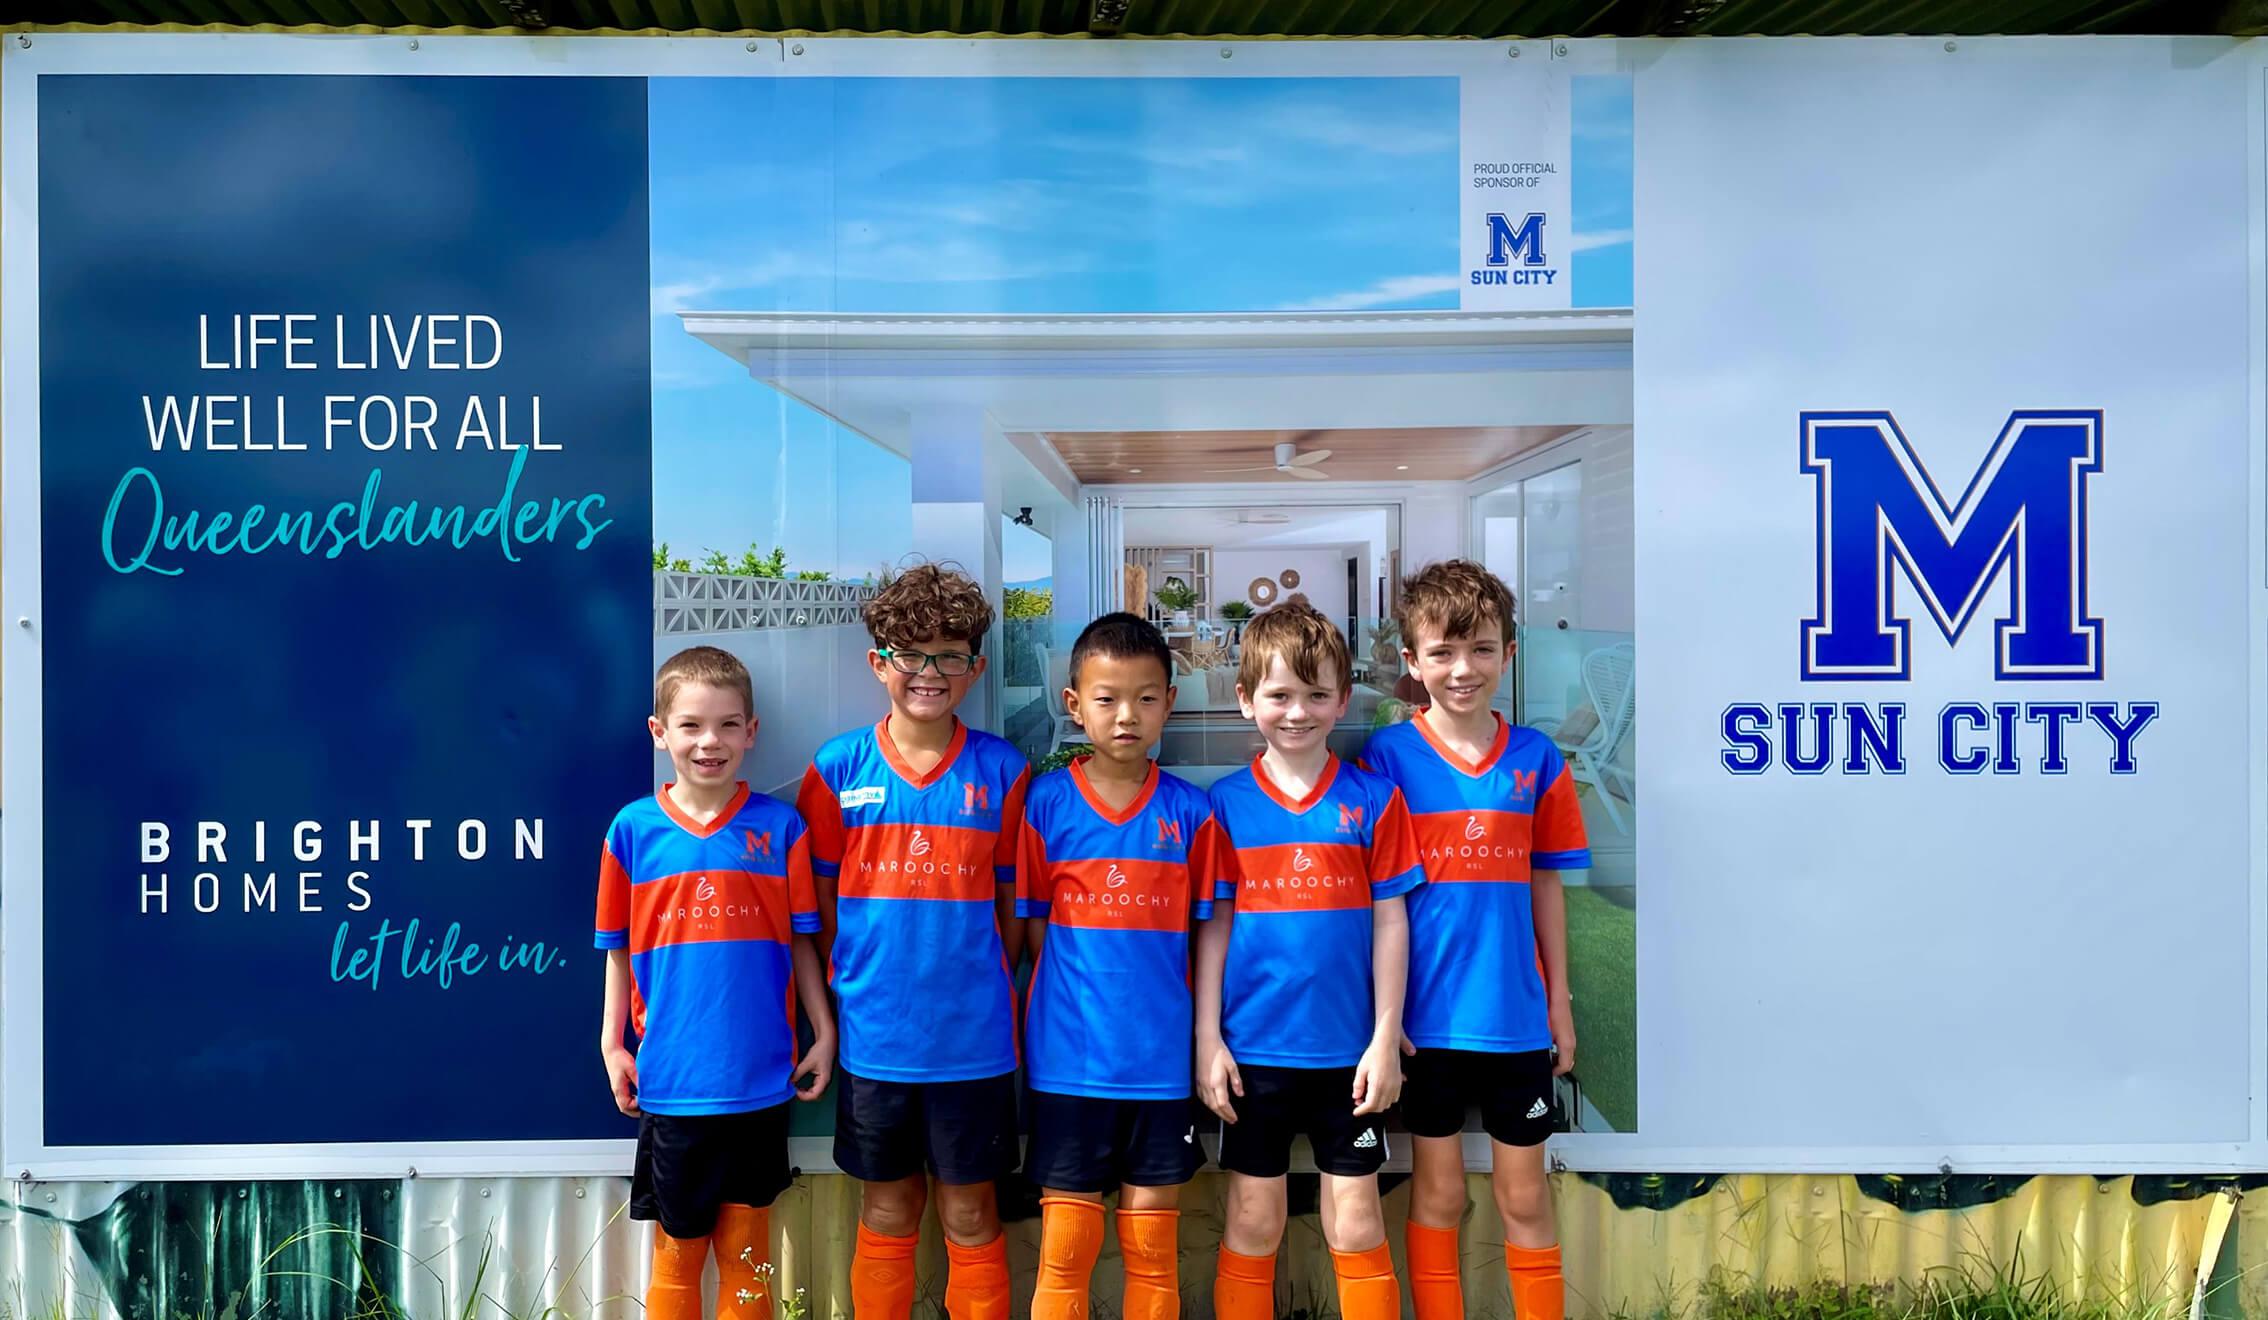 Mooloolaba SunCity Soccer Club